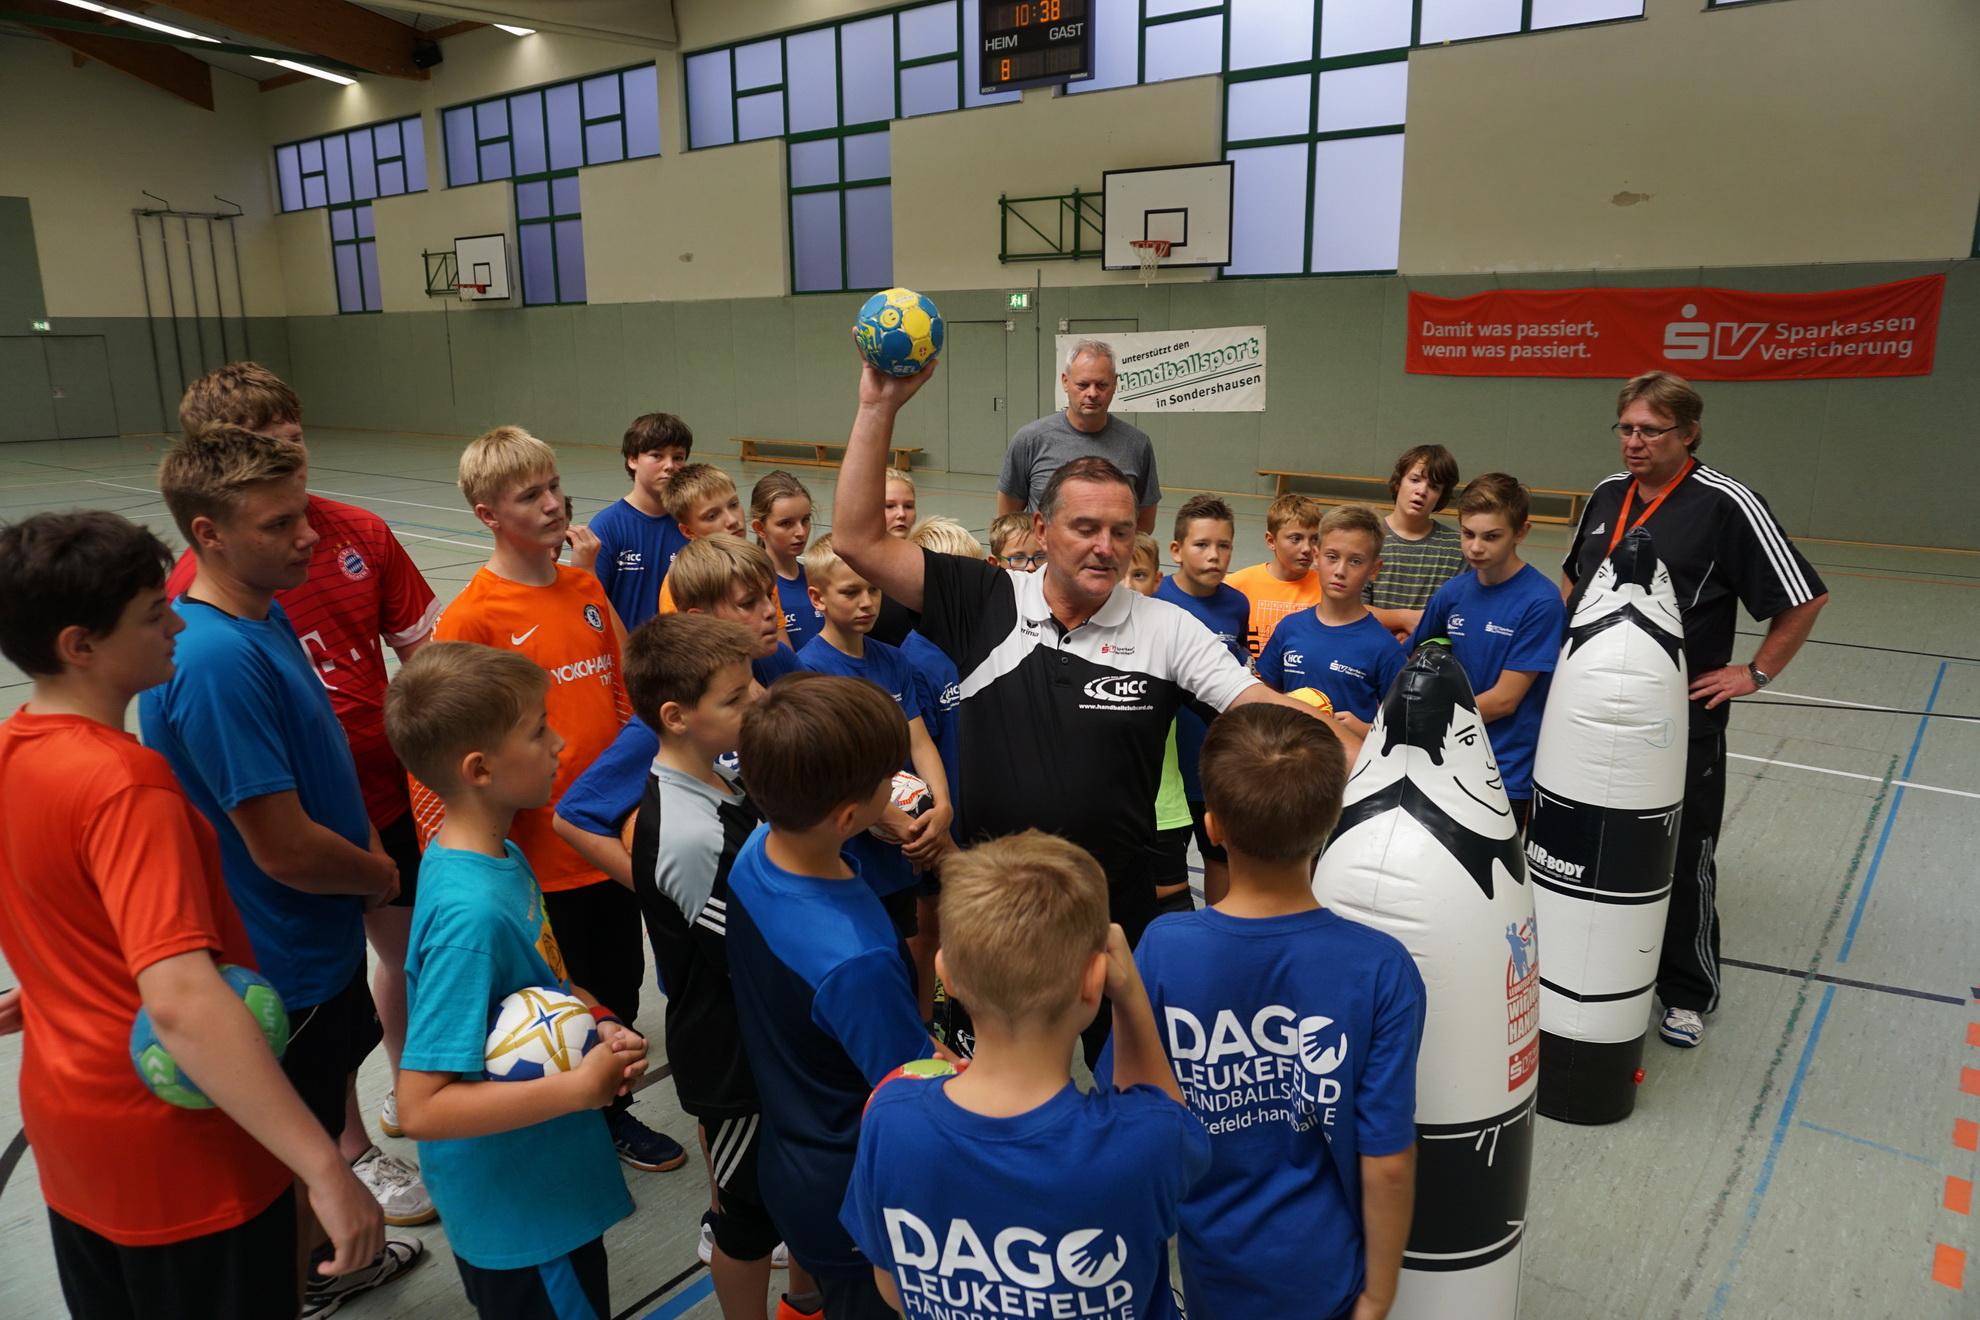 201808_Handballcamp_SDH_MG_195w